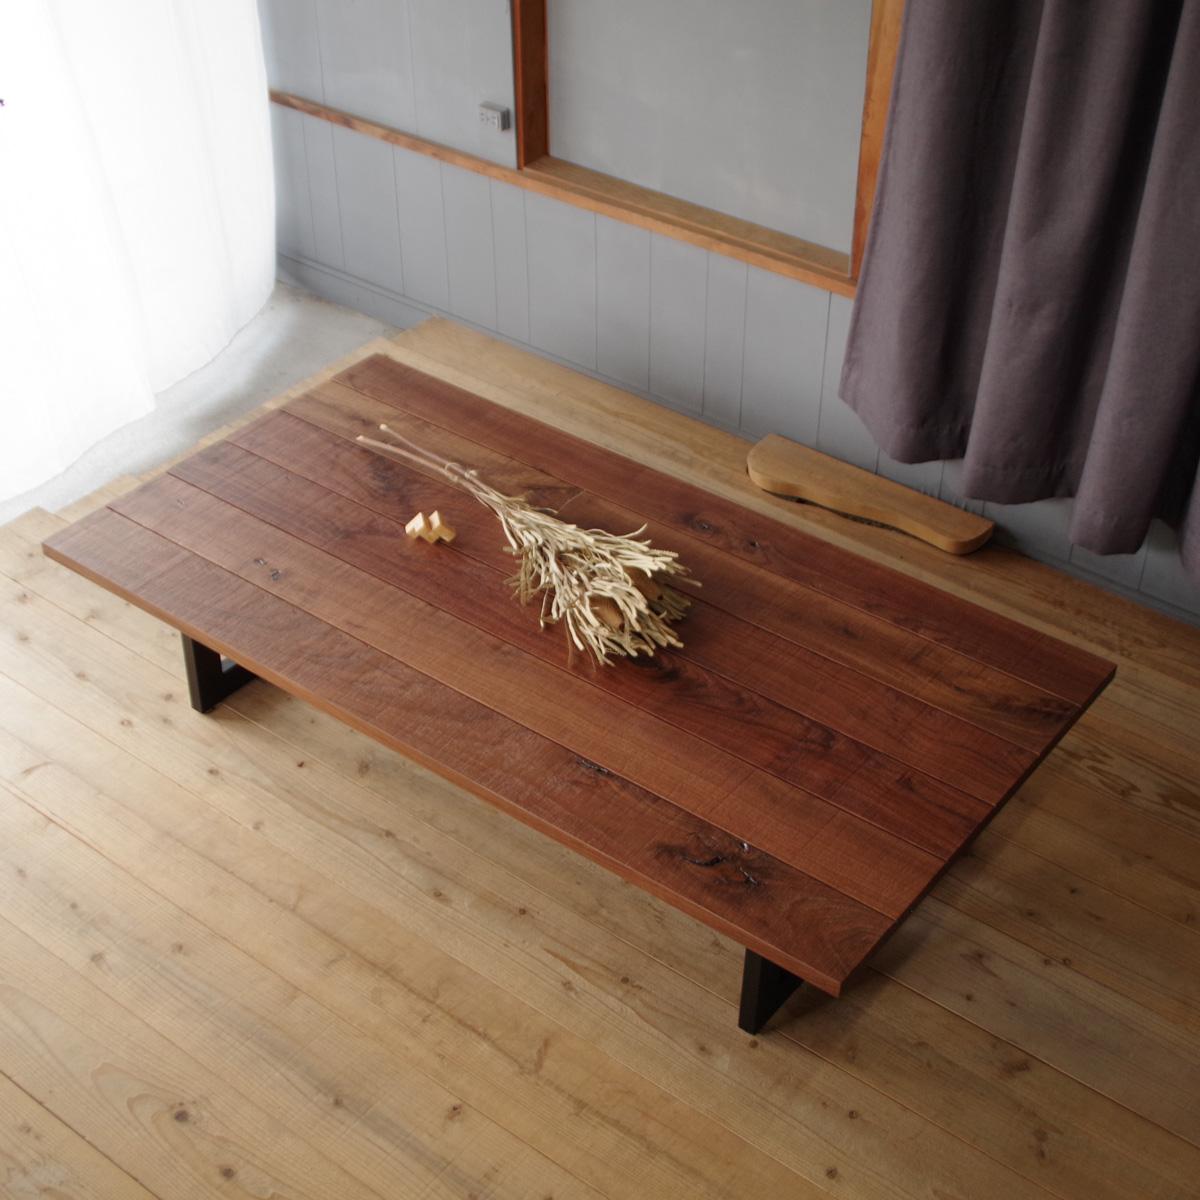 LT-Origin - walnut座卓 160×85 長方形 ウォールナット節入無垢材 アイアン脚|北欧|和風|モダン|シンプル|デザイン||おしゃれ||日本製|リビングテーブル|国産リビングテーブル||センターテーブル|ローテーブル|座卓|DIY|アイアン|男前|